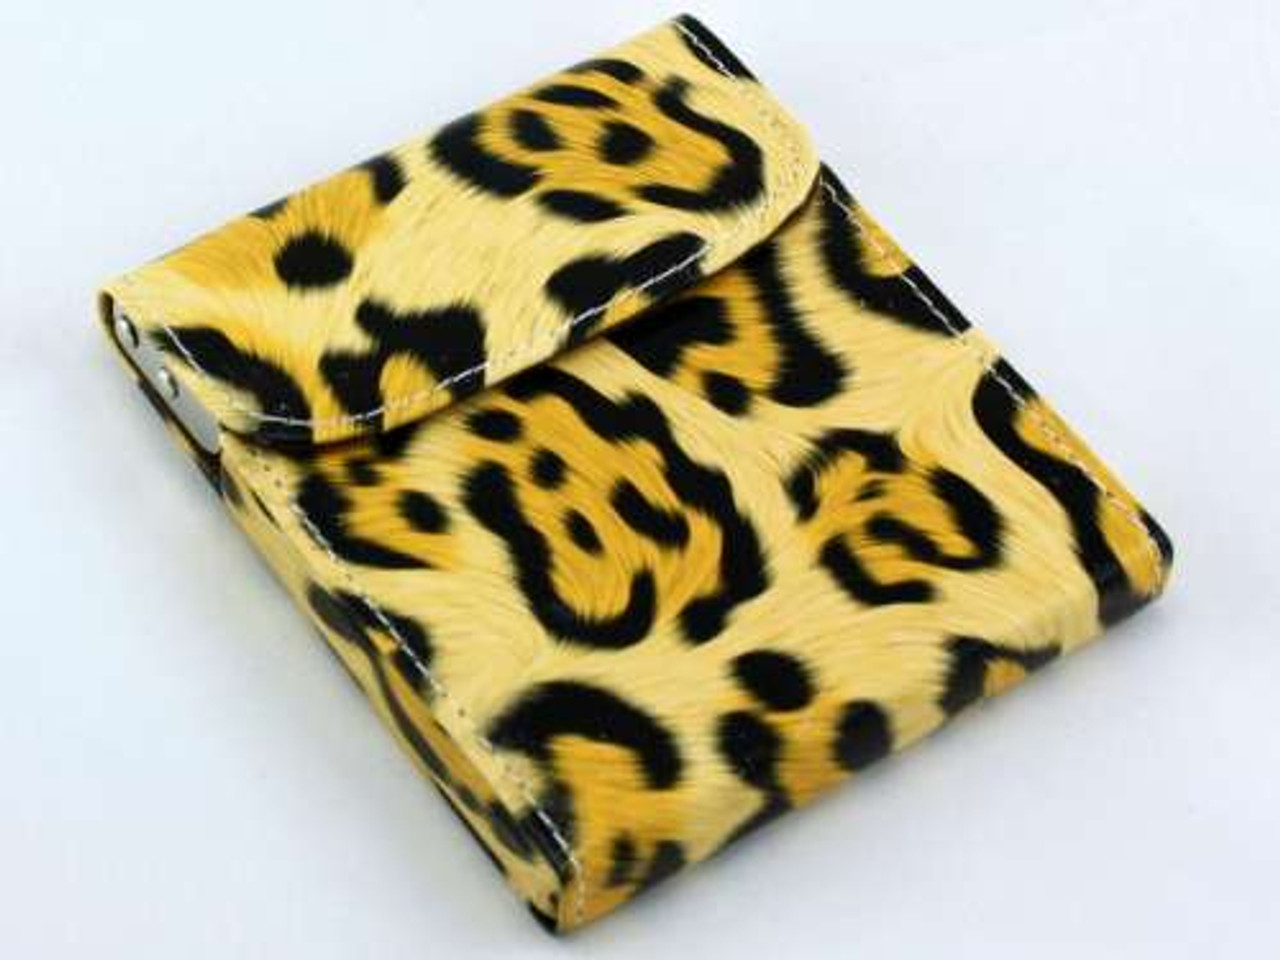 Cheetah Flip Top Cigarette Case